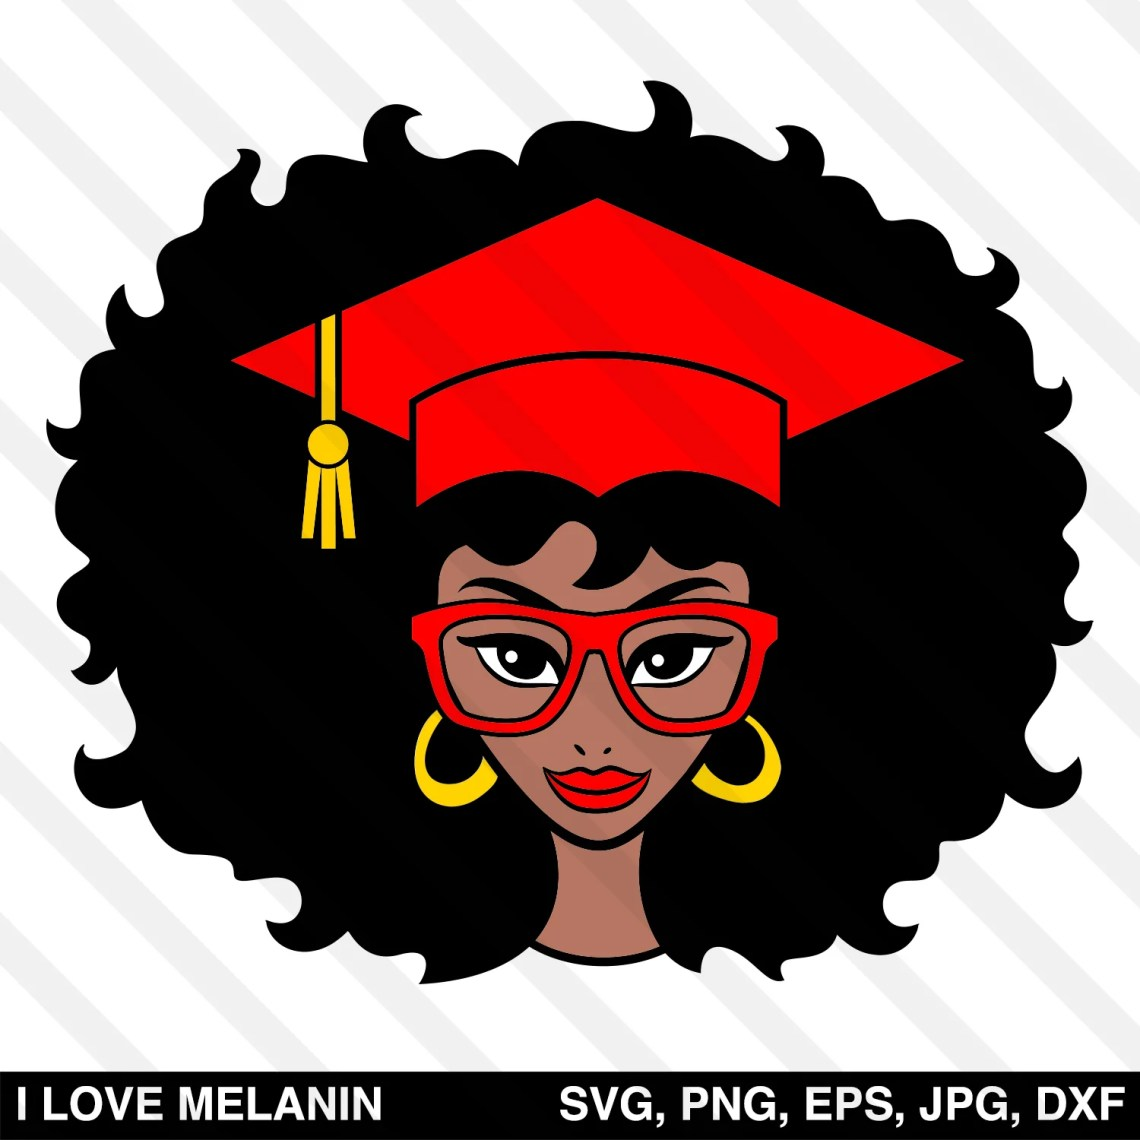 Download Graduation Black Woman SVG - I Love Melanin